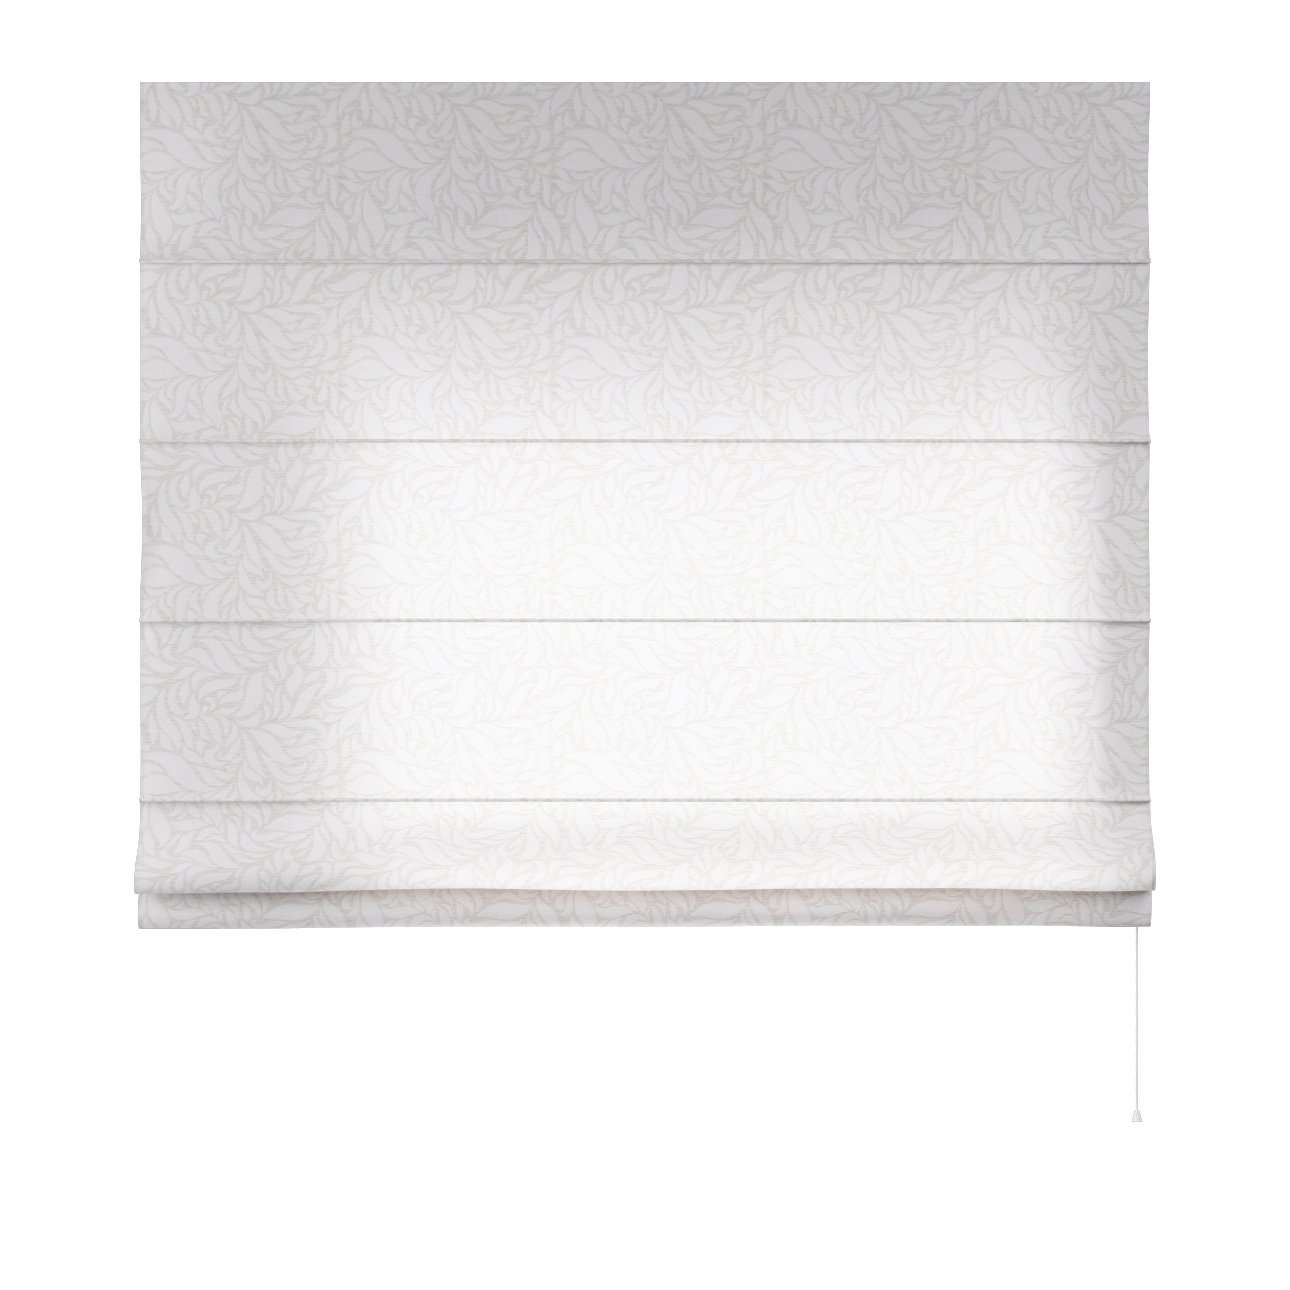 Romanetės Capri 80 x 170 cm (plotis x ilgis) kolekcijoje Venice, audinys: 140-50